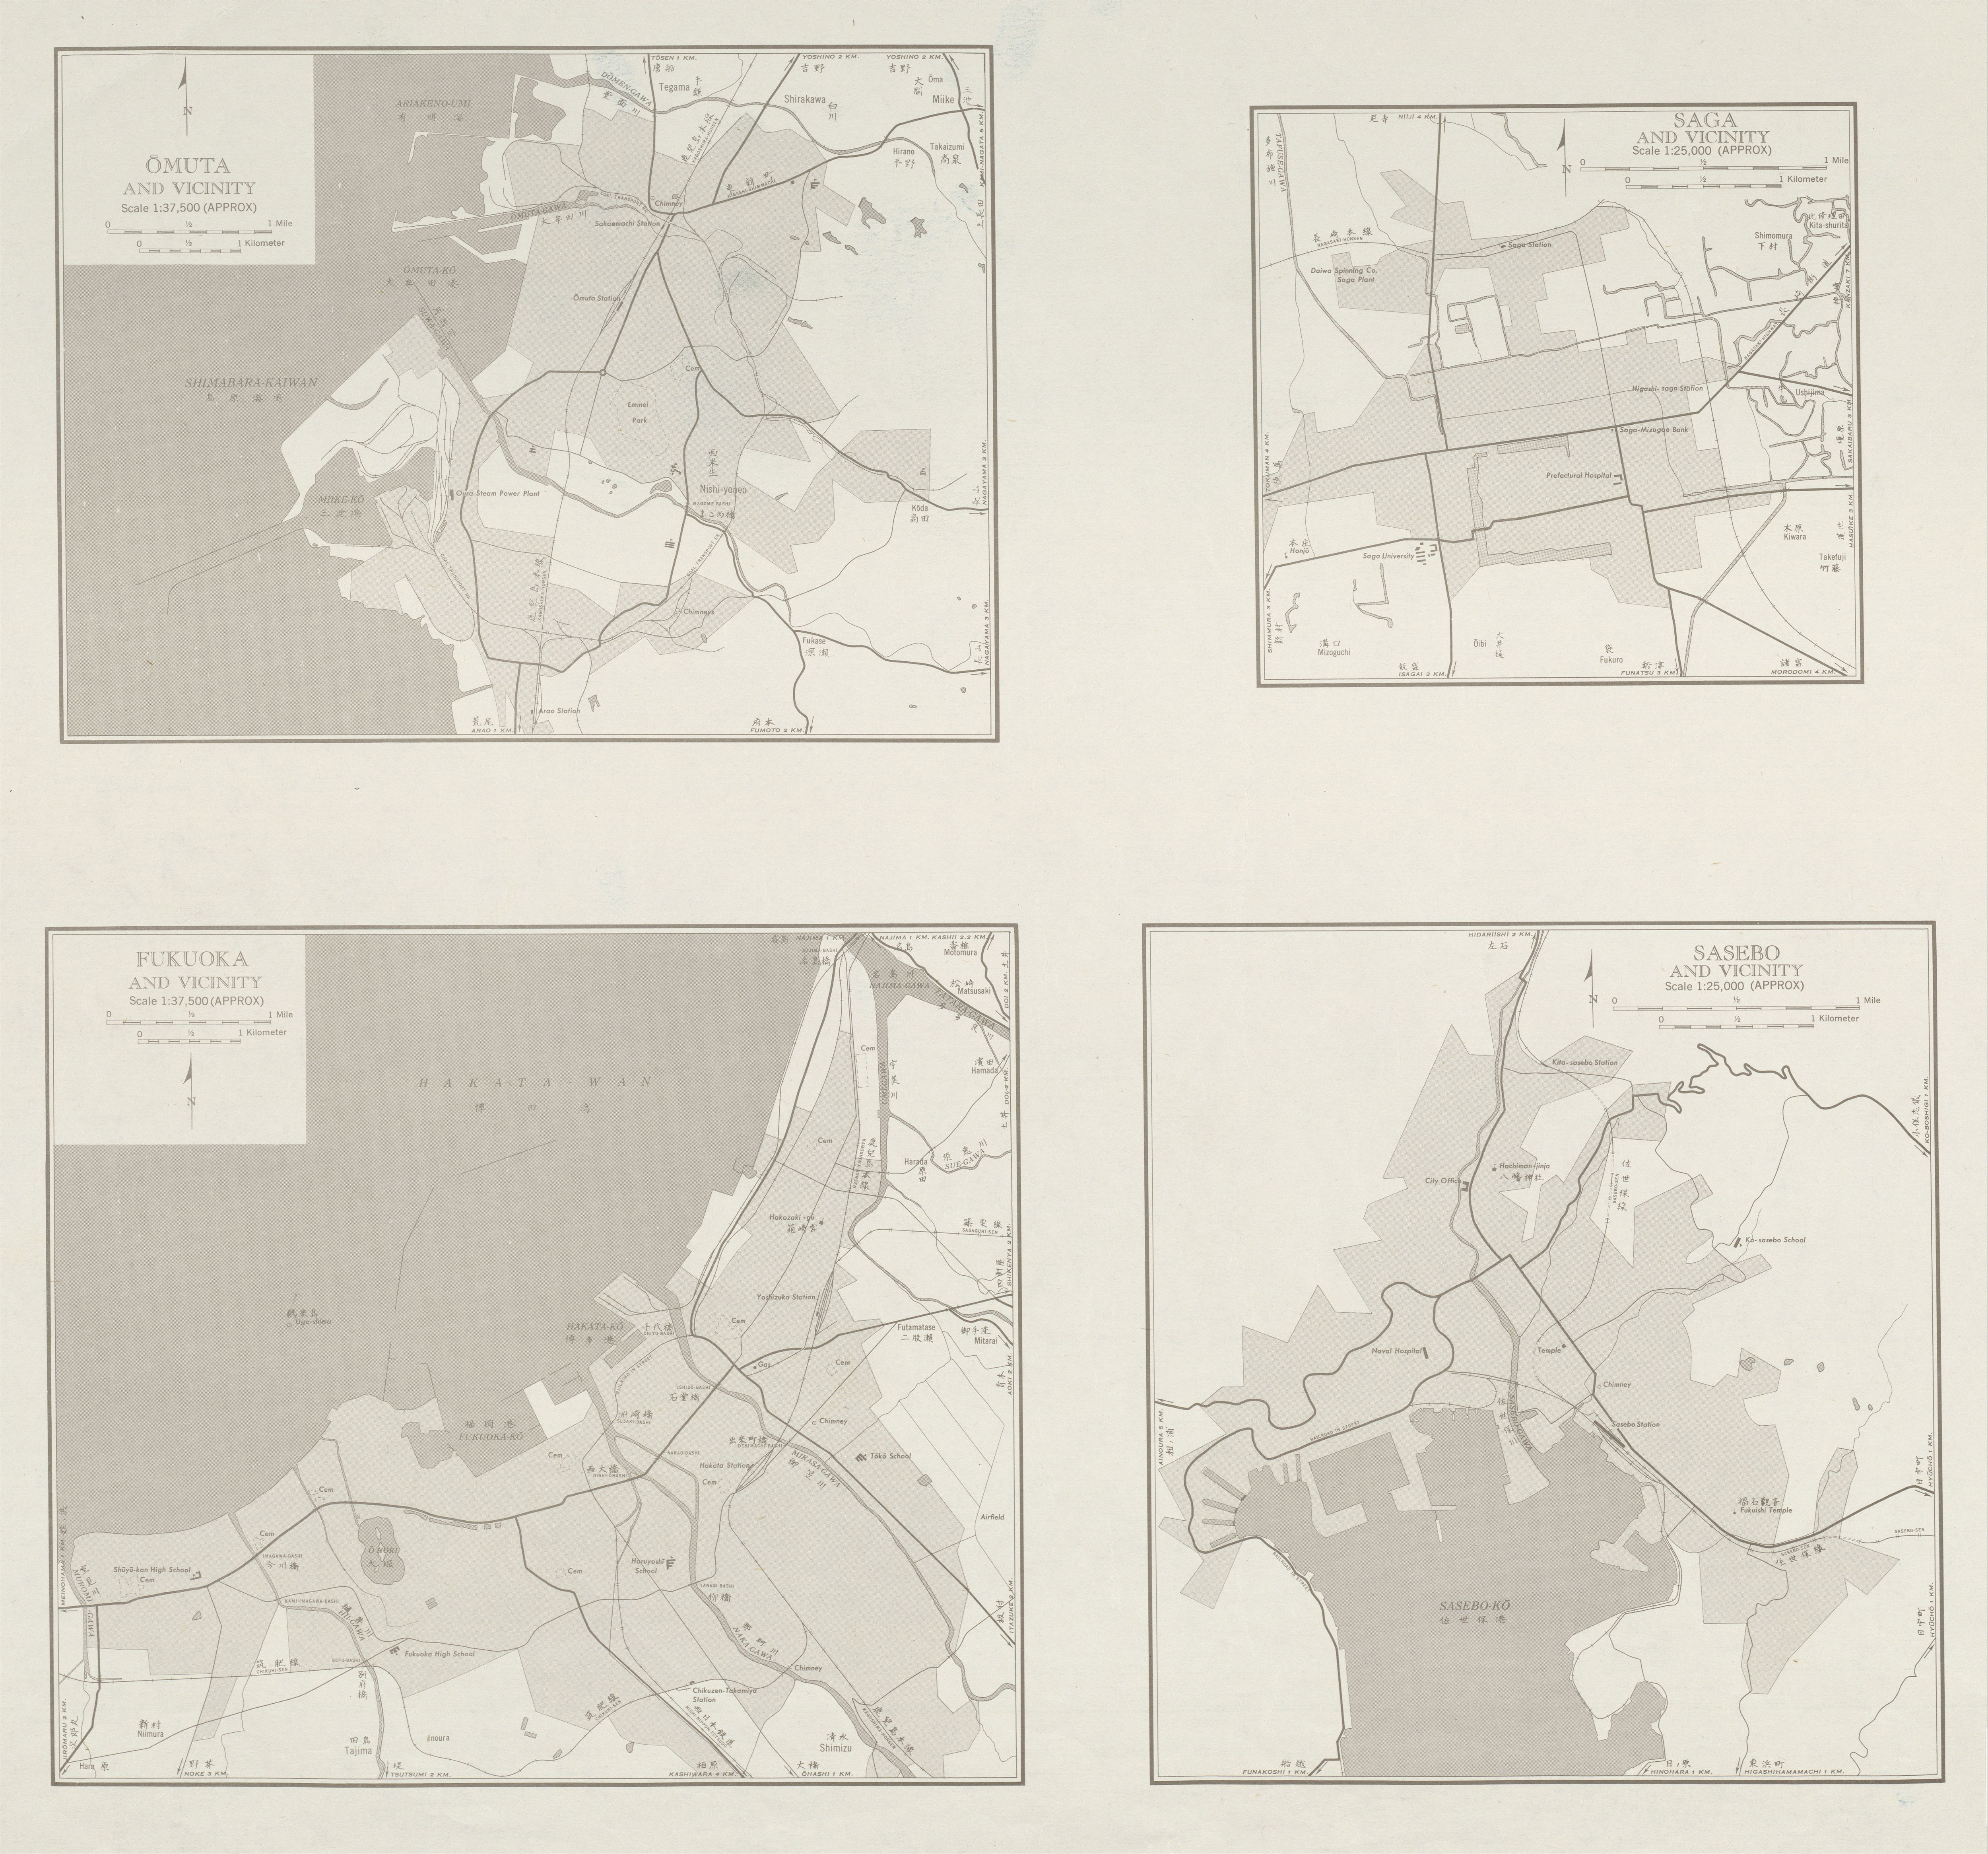 Mapas de Omuta, Saga, Fukuoka y sus Cercanias Hoja, Japón 1954